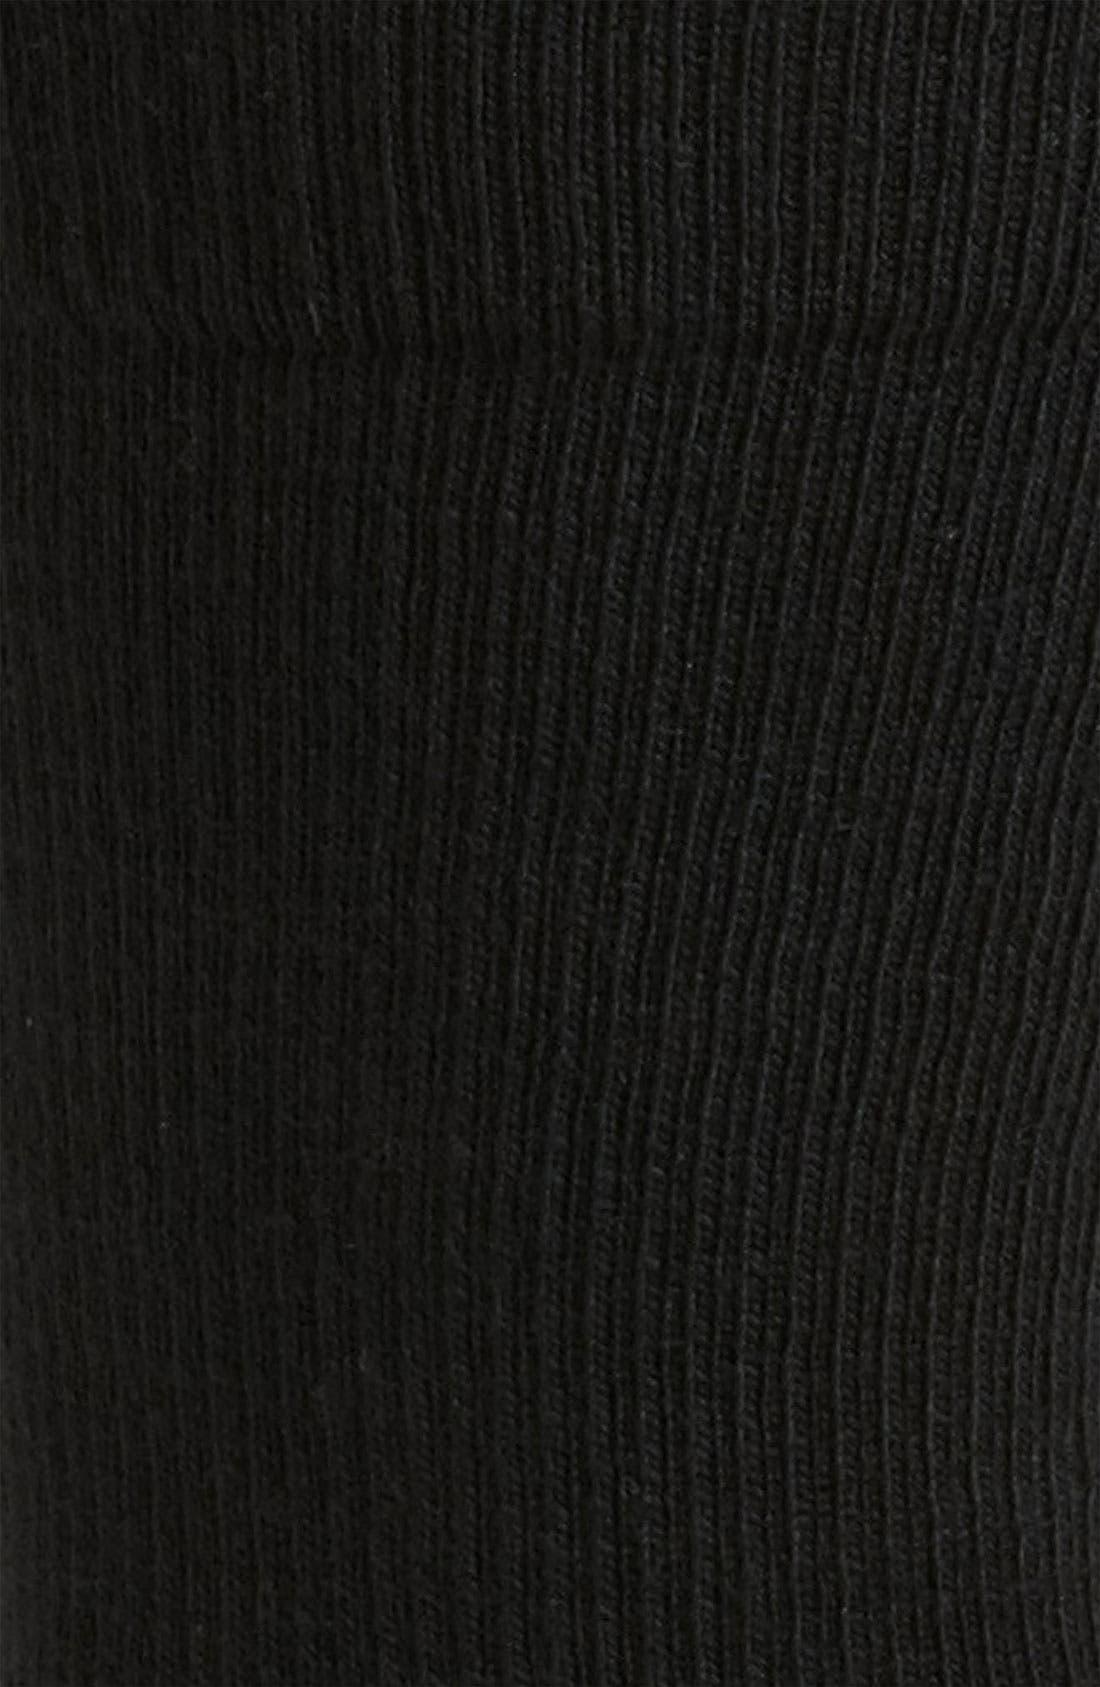 Alternate Image 2  - FITS Sock Co. 'Liner' Crew Socks (Online Only)